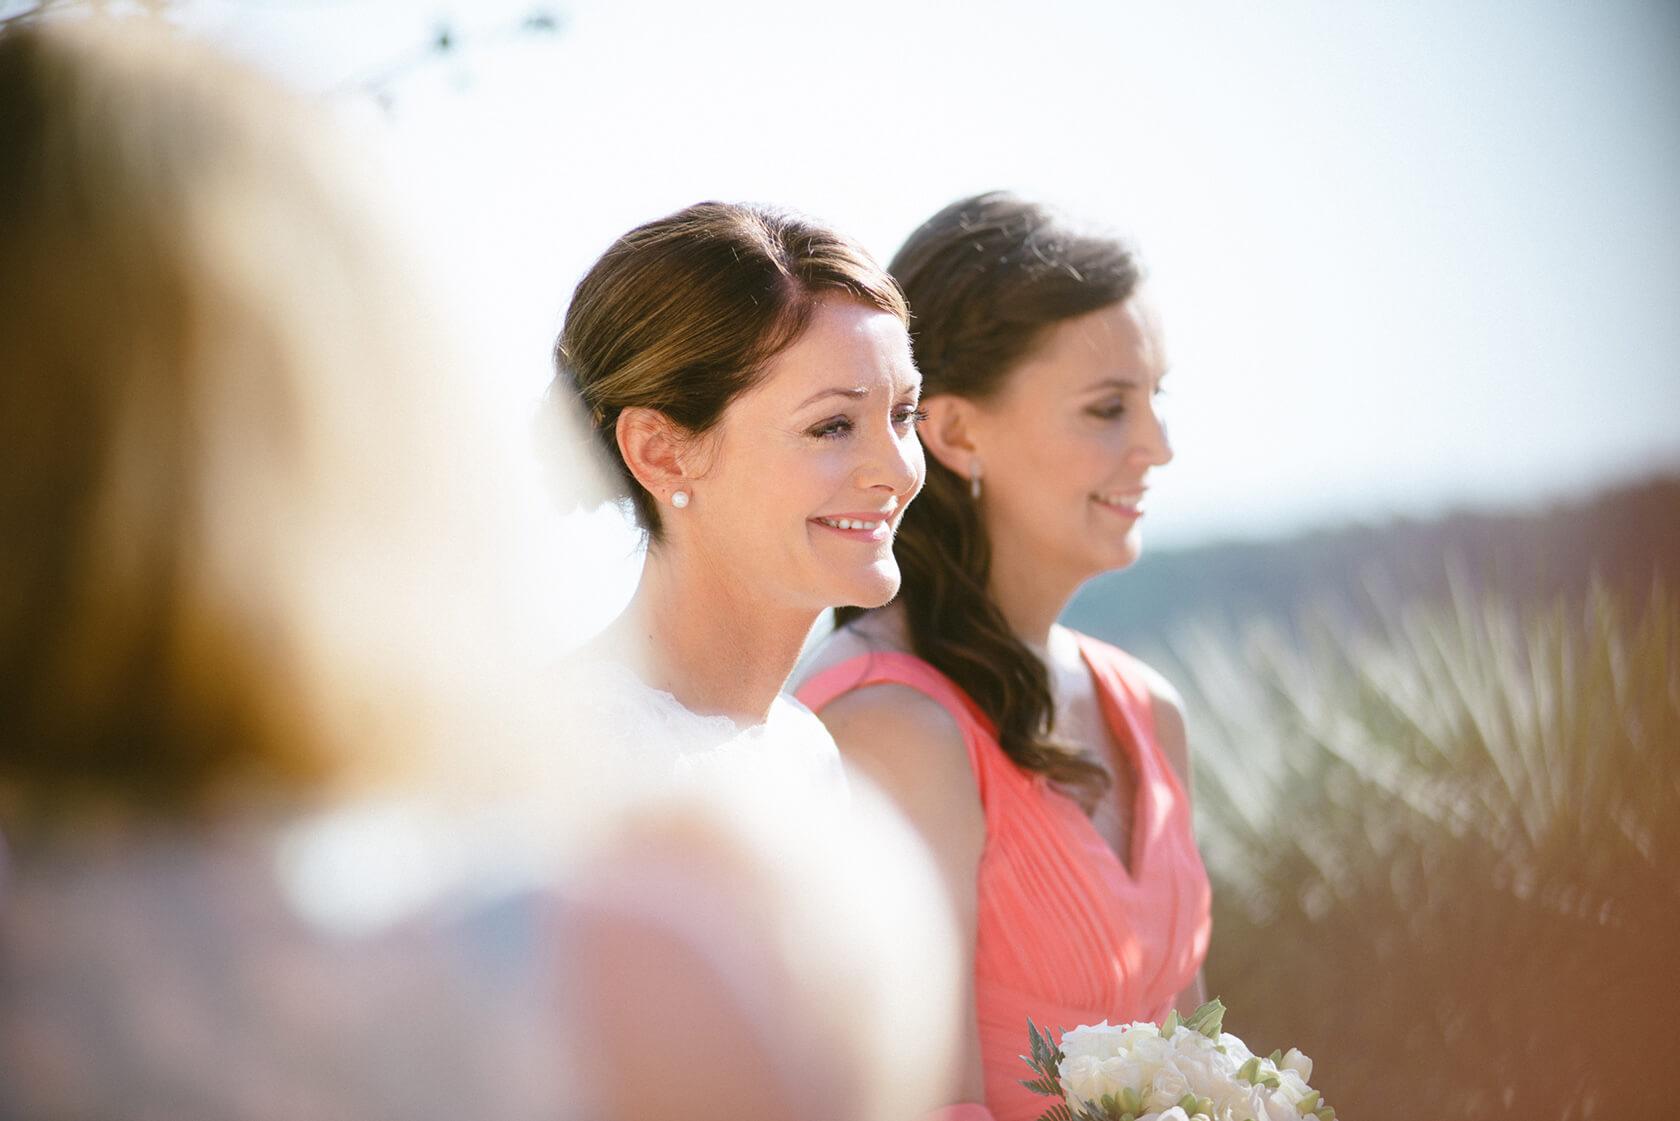 Bryllup masia sumidors sitges destination wedding